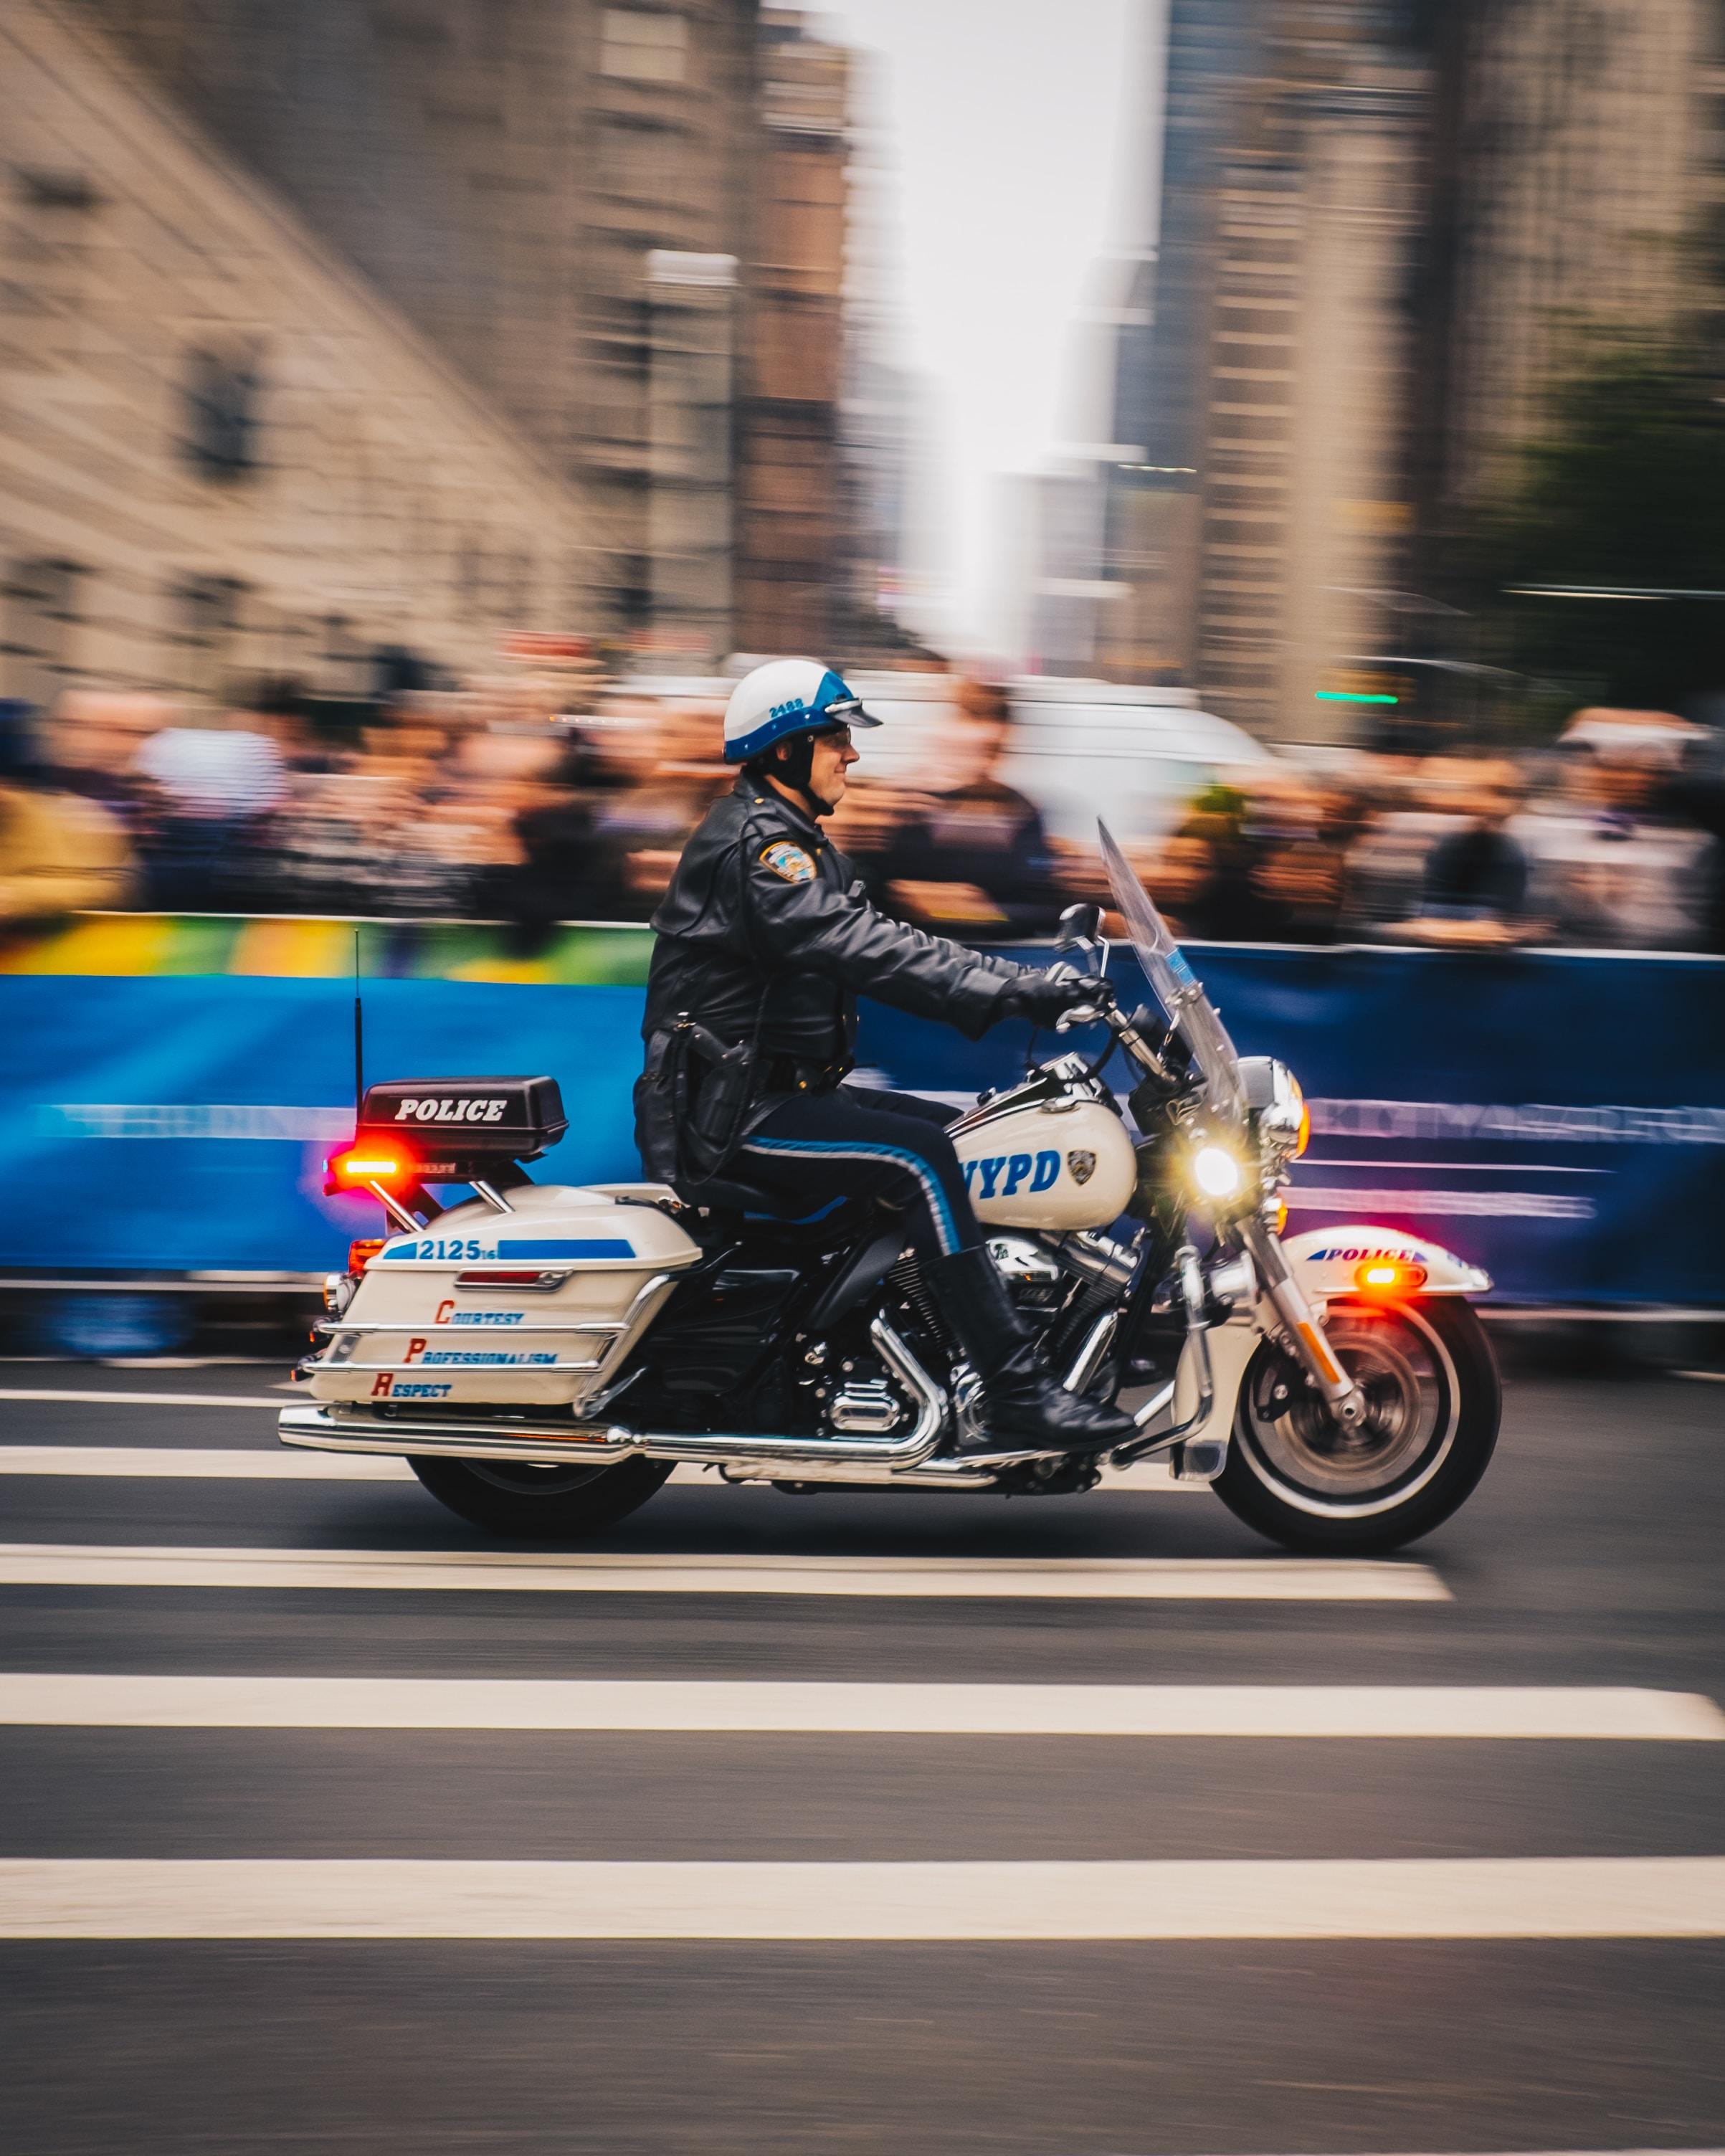 policeman riding on white motorcycle